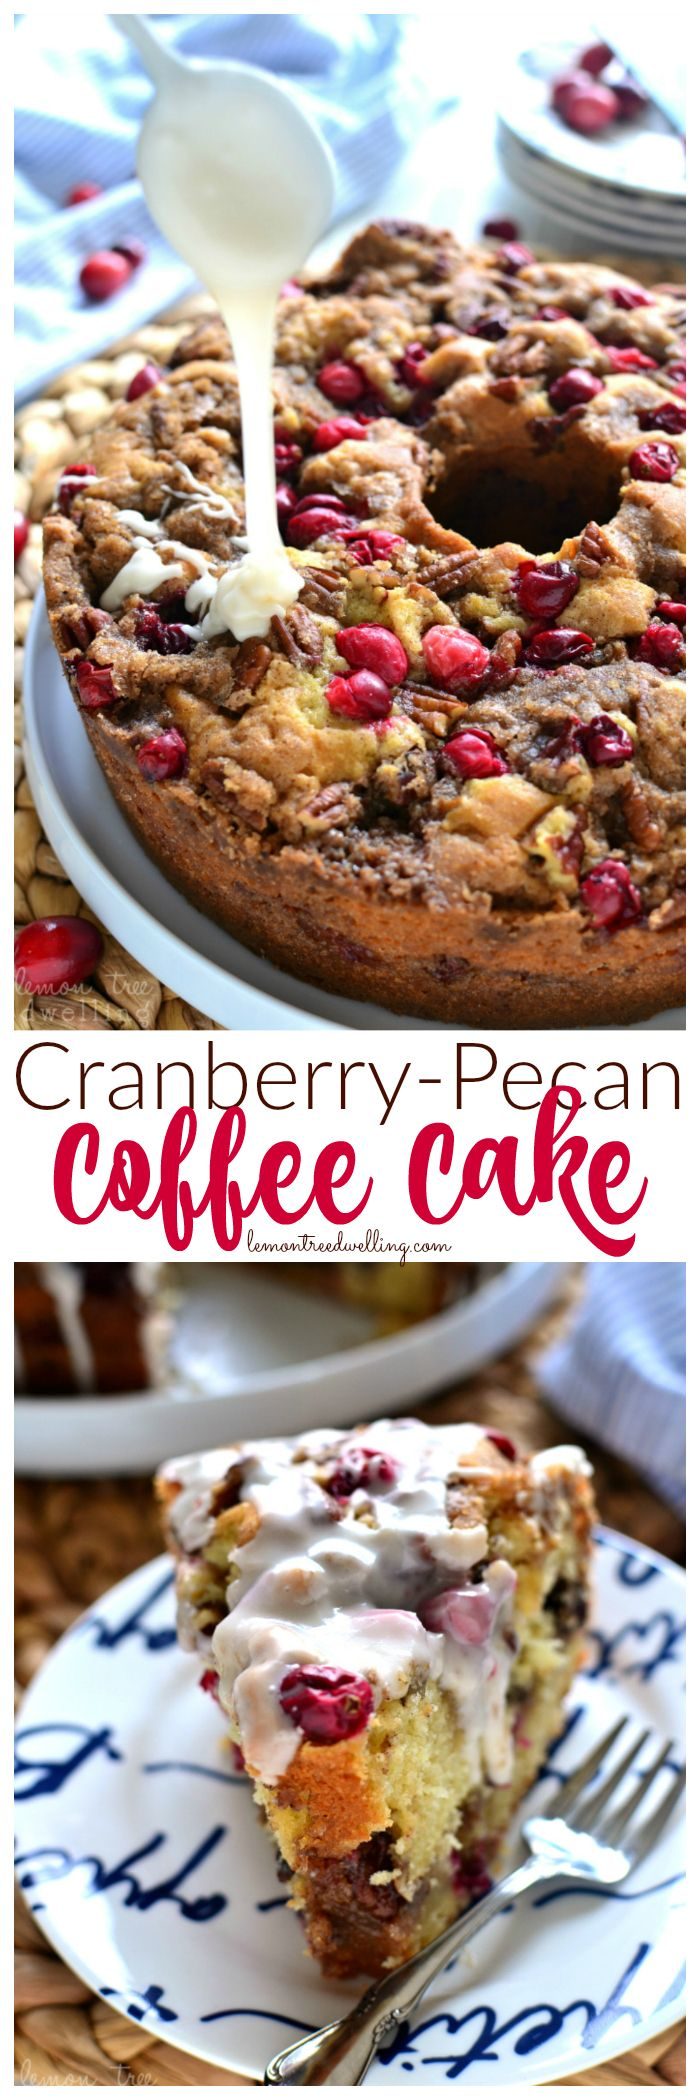 This Cranberry-Pecan Coffee Cake is packed with fresh cranberries, pecans, and brown sugar streusel. 2x de boter, Met sinaasappel rasp en een beetje sap, yoghurt, koekkruiden, kaneel en gember in het beslag.